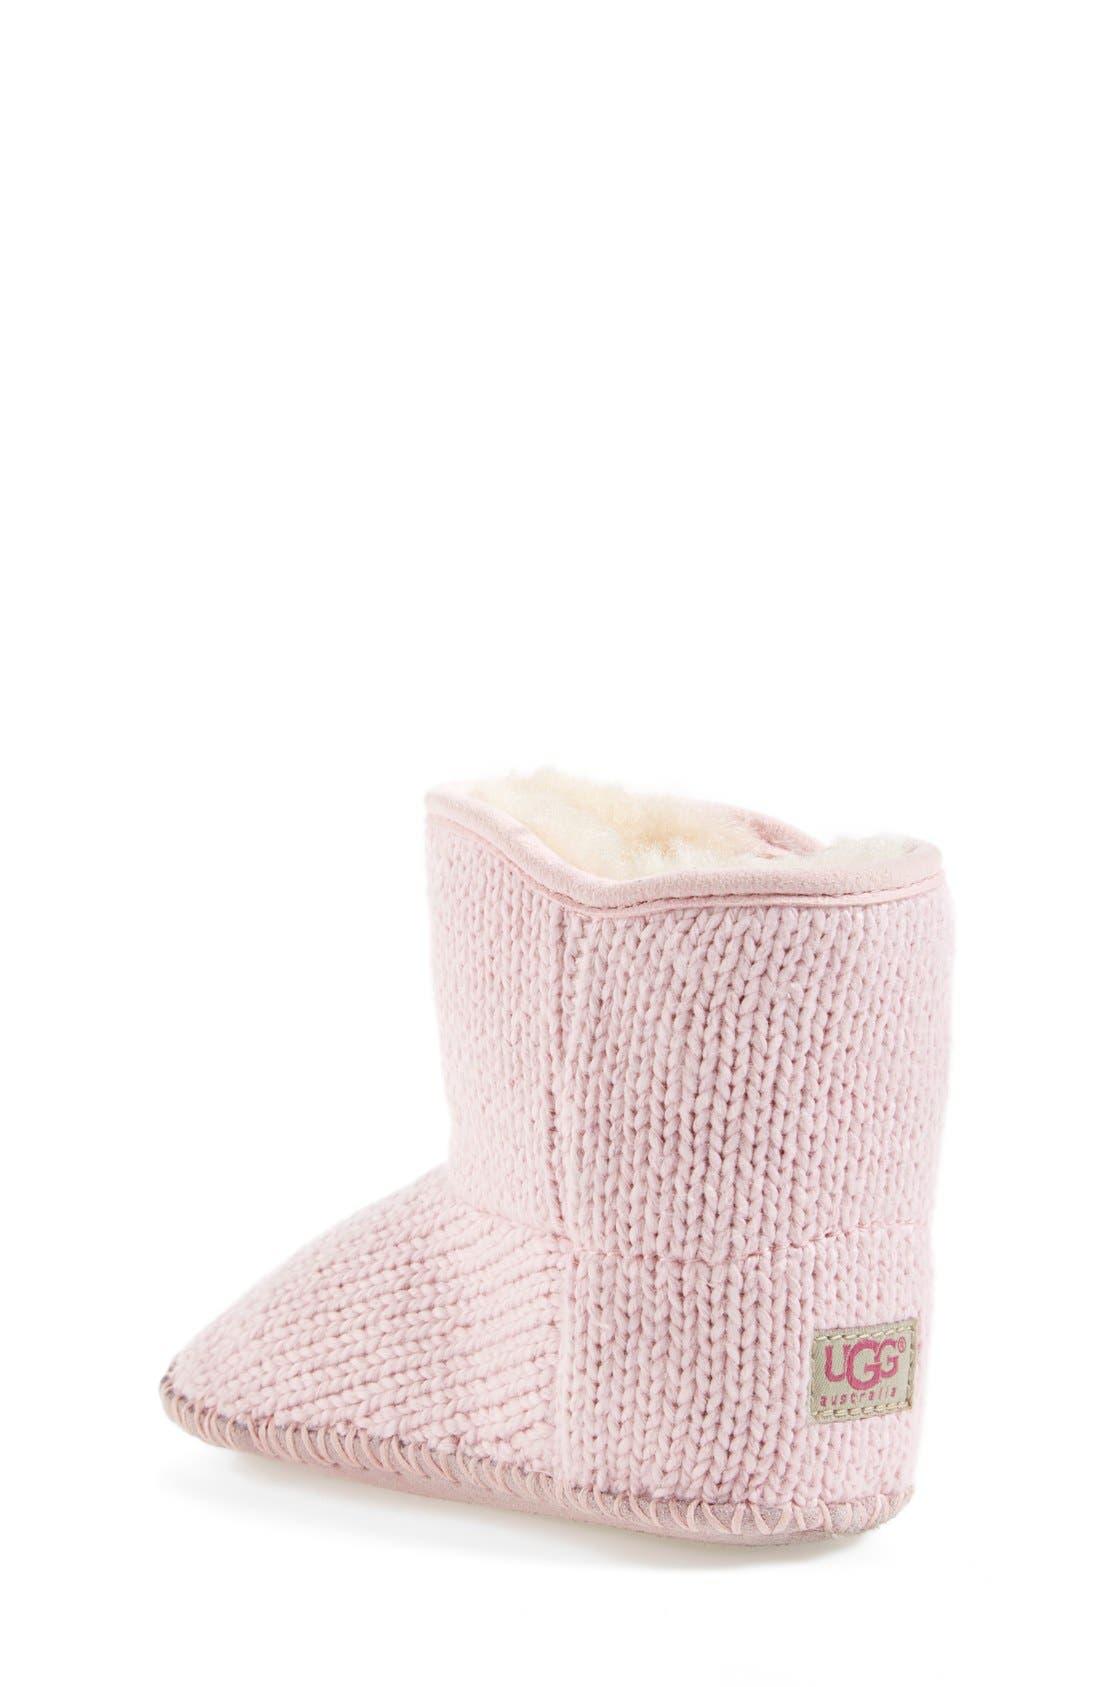 Alternate Image 2  - UGG® Purl Knit Bootie (Baby & Walker)